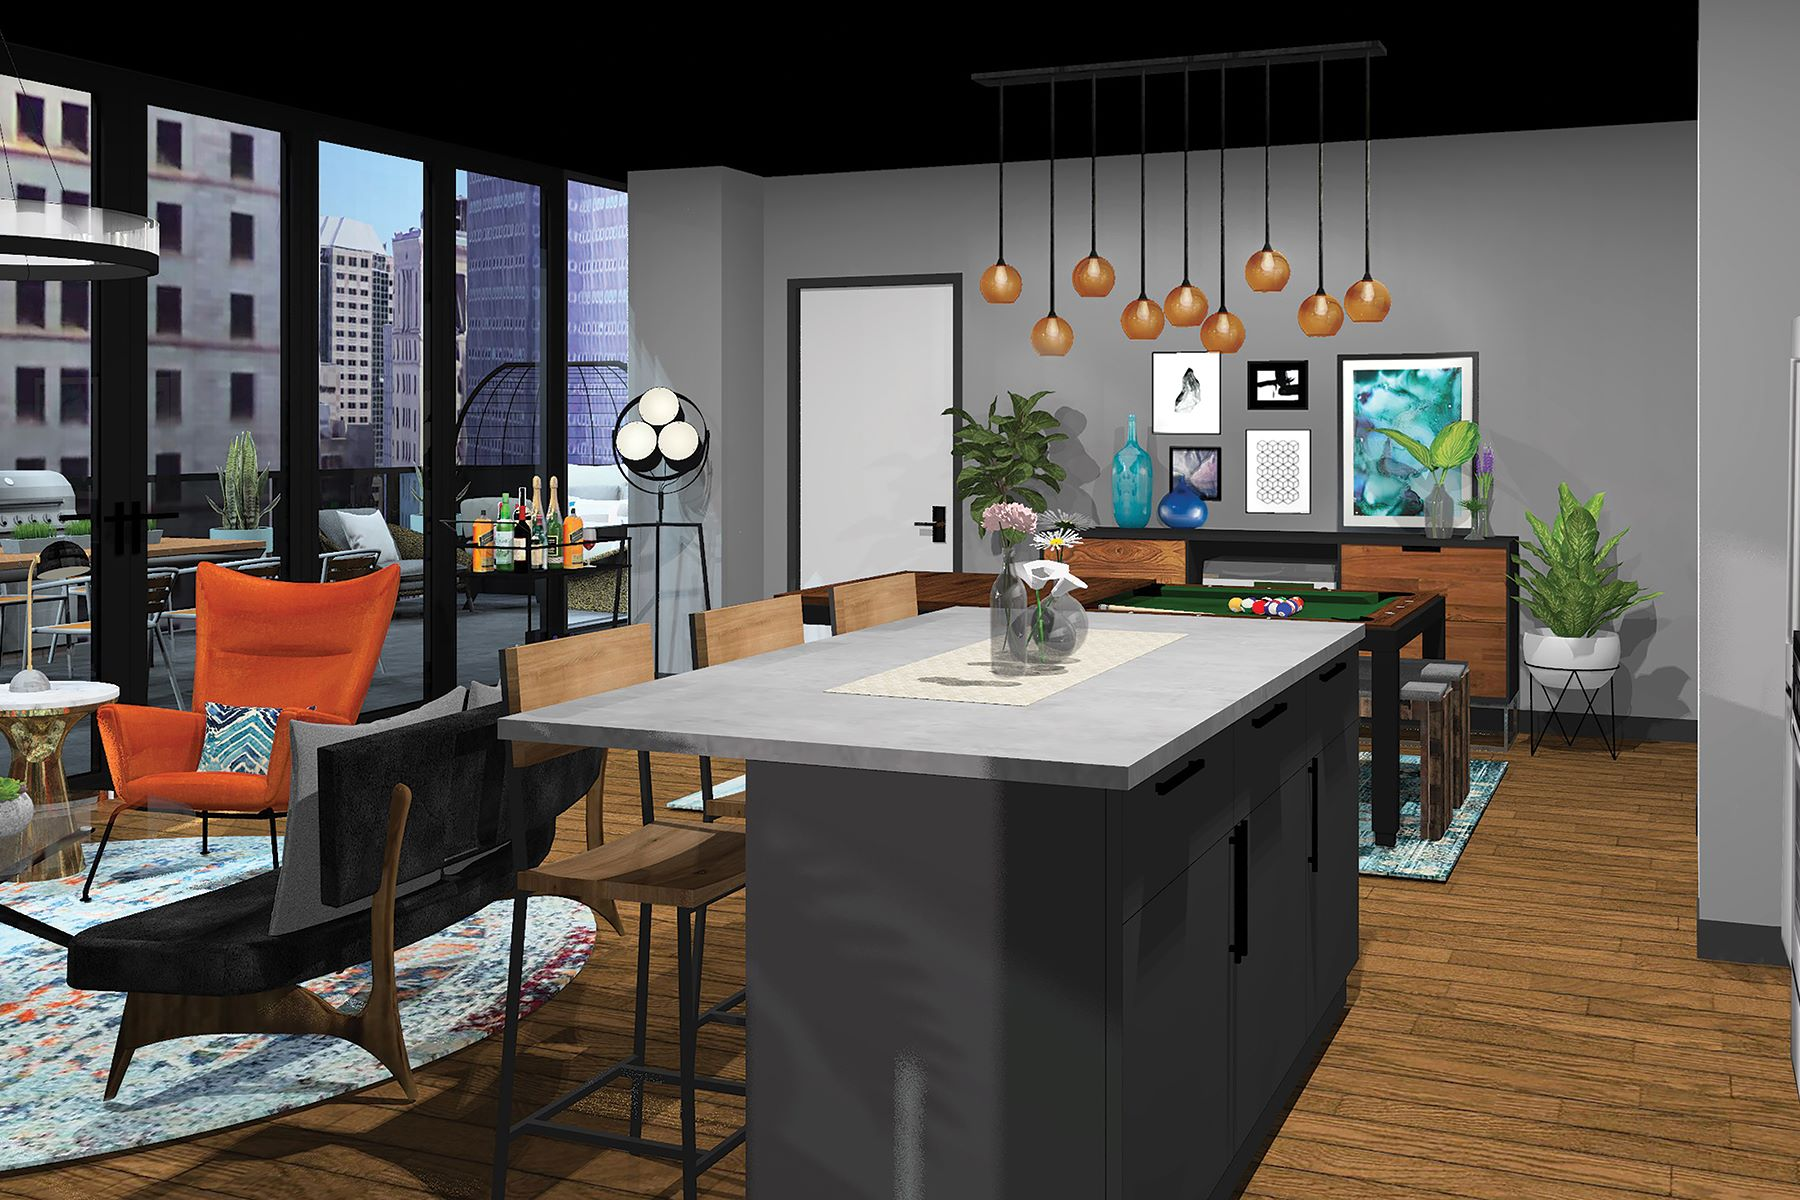 共管式独立产权公寓 为 销售 在 The Estella Residence at Lumiére 350 Oliver Avenue #1010, Downtown Pittsburgh, Pittsburgh, 宾夕法尼亚州, 15222 美国